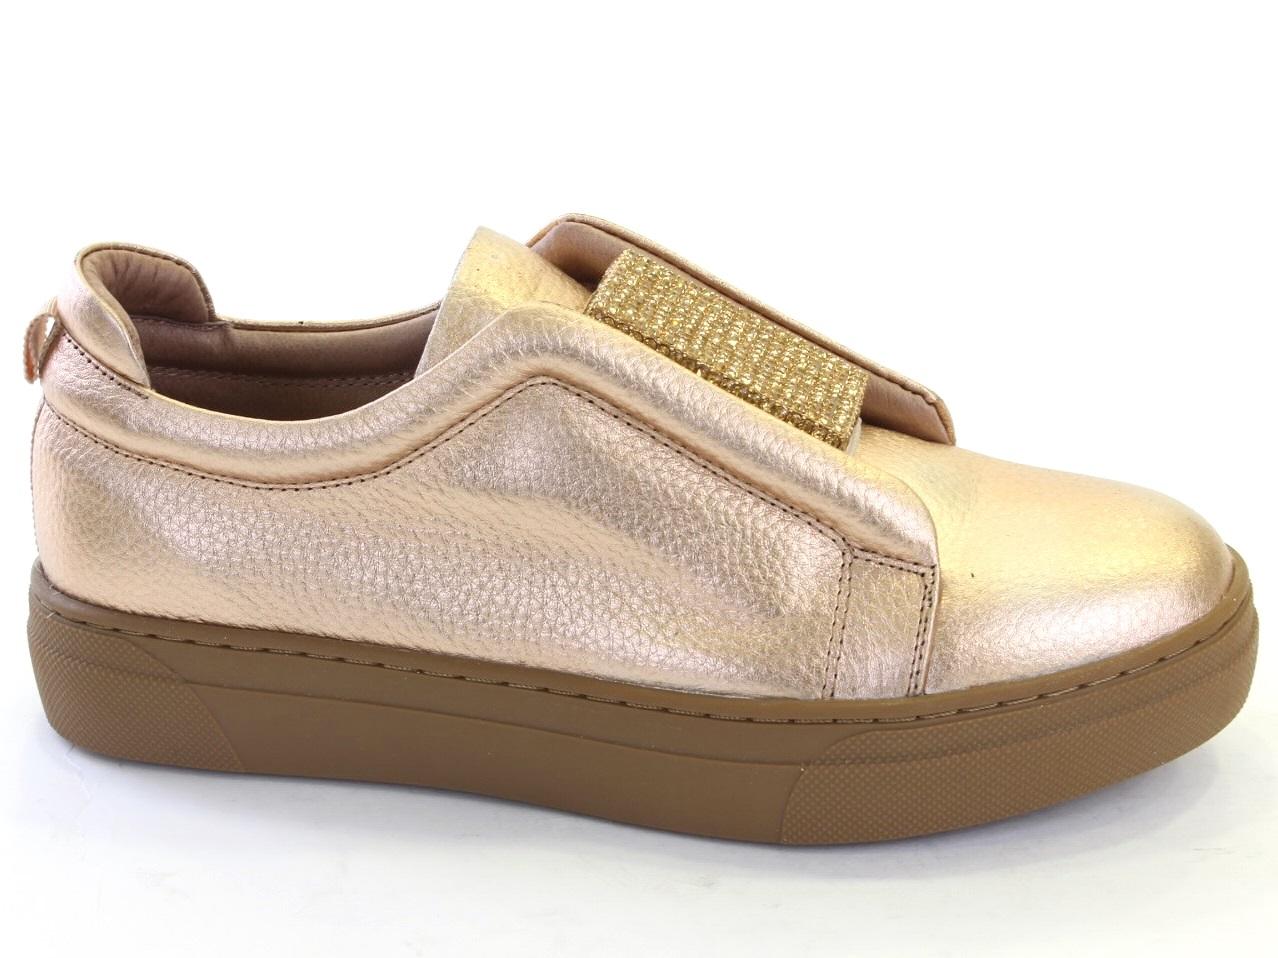 Sneakers and Espadrilles Uma Parker - 656 703012NP